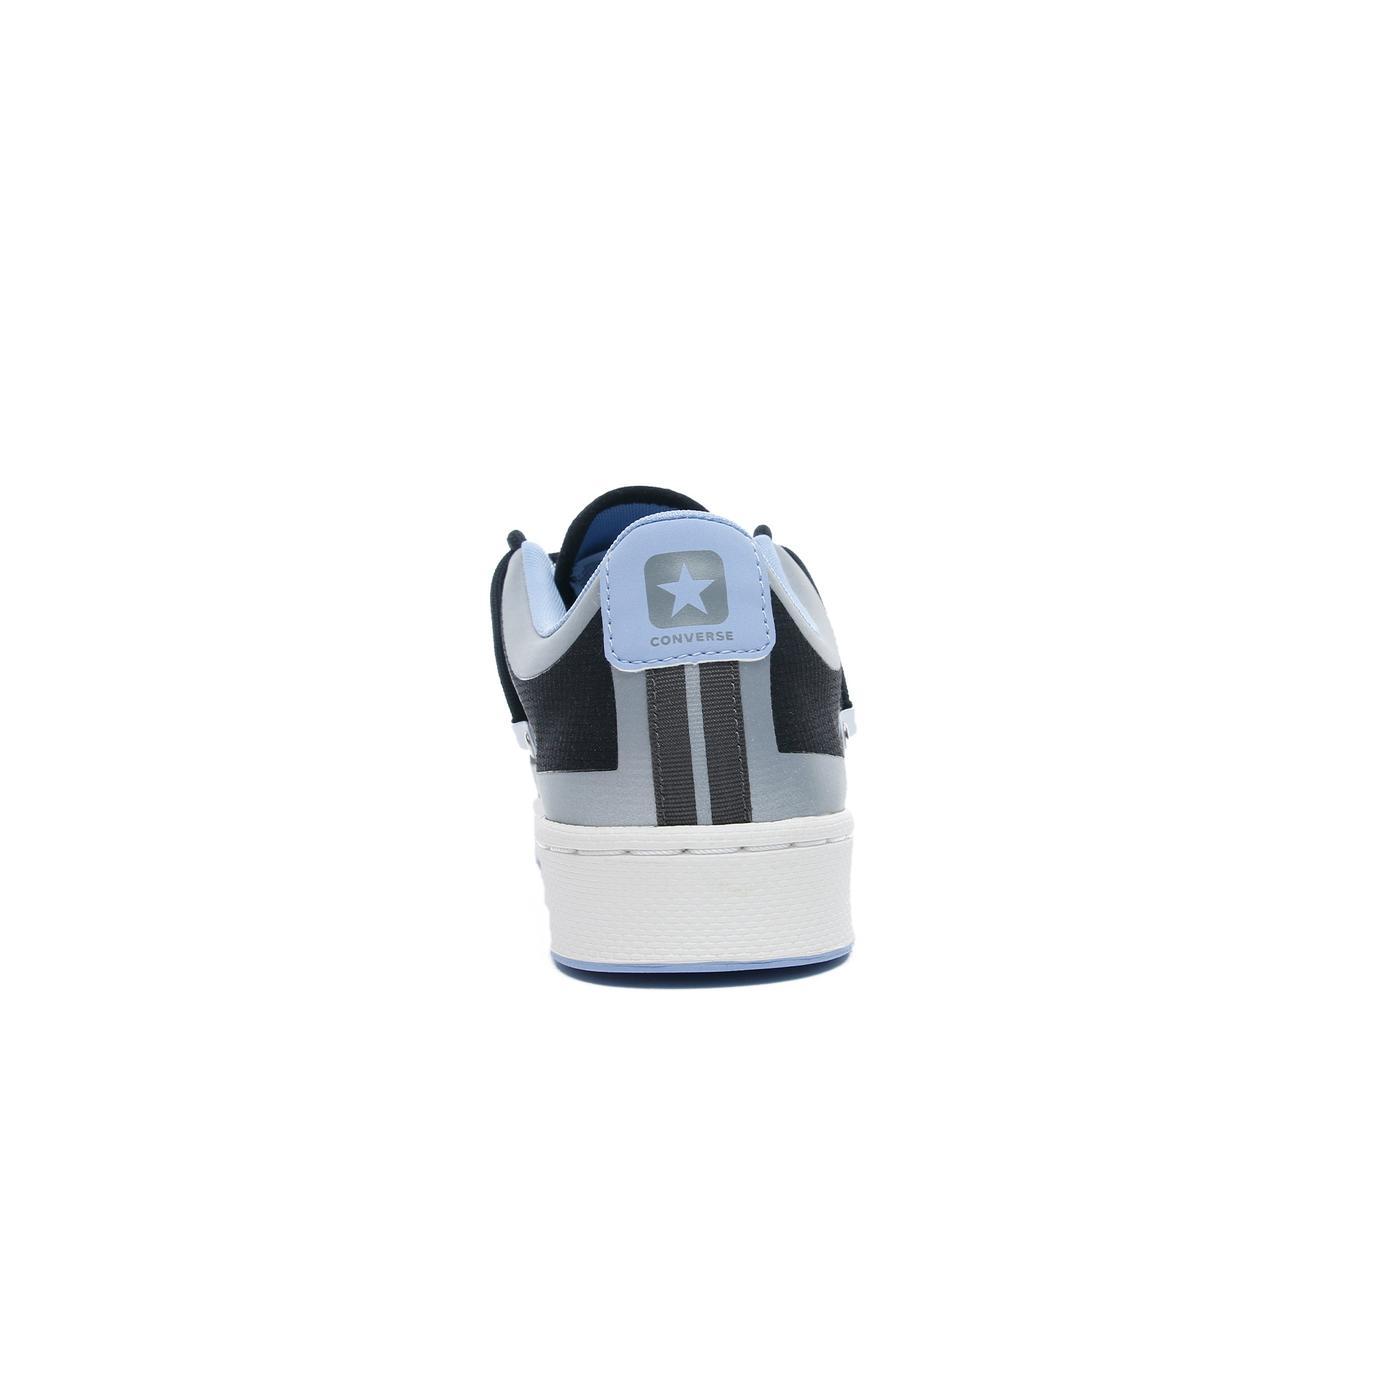 Converse Pro Leather Low Fuse Tape Erkek Siyah Sneaker